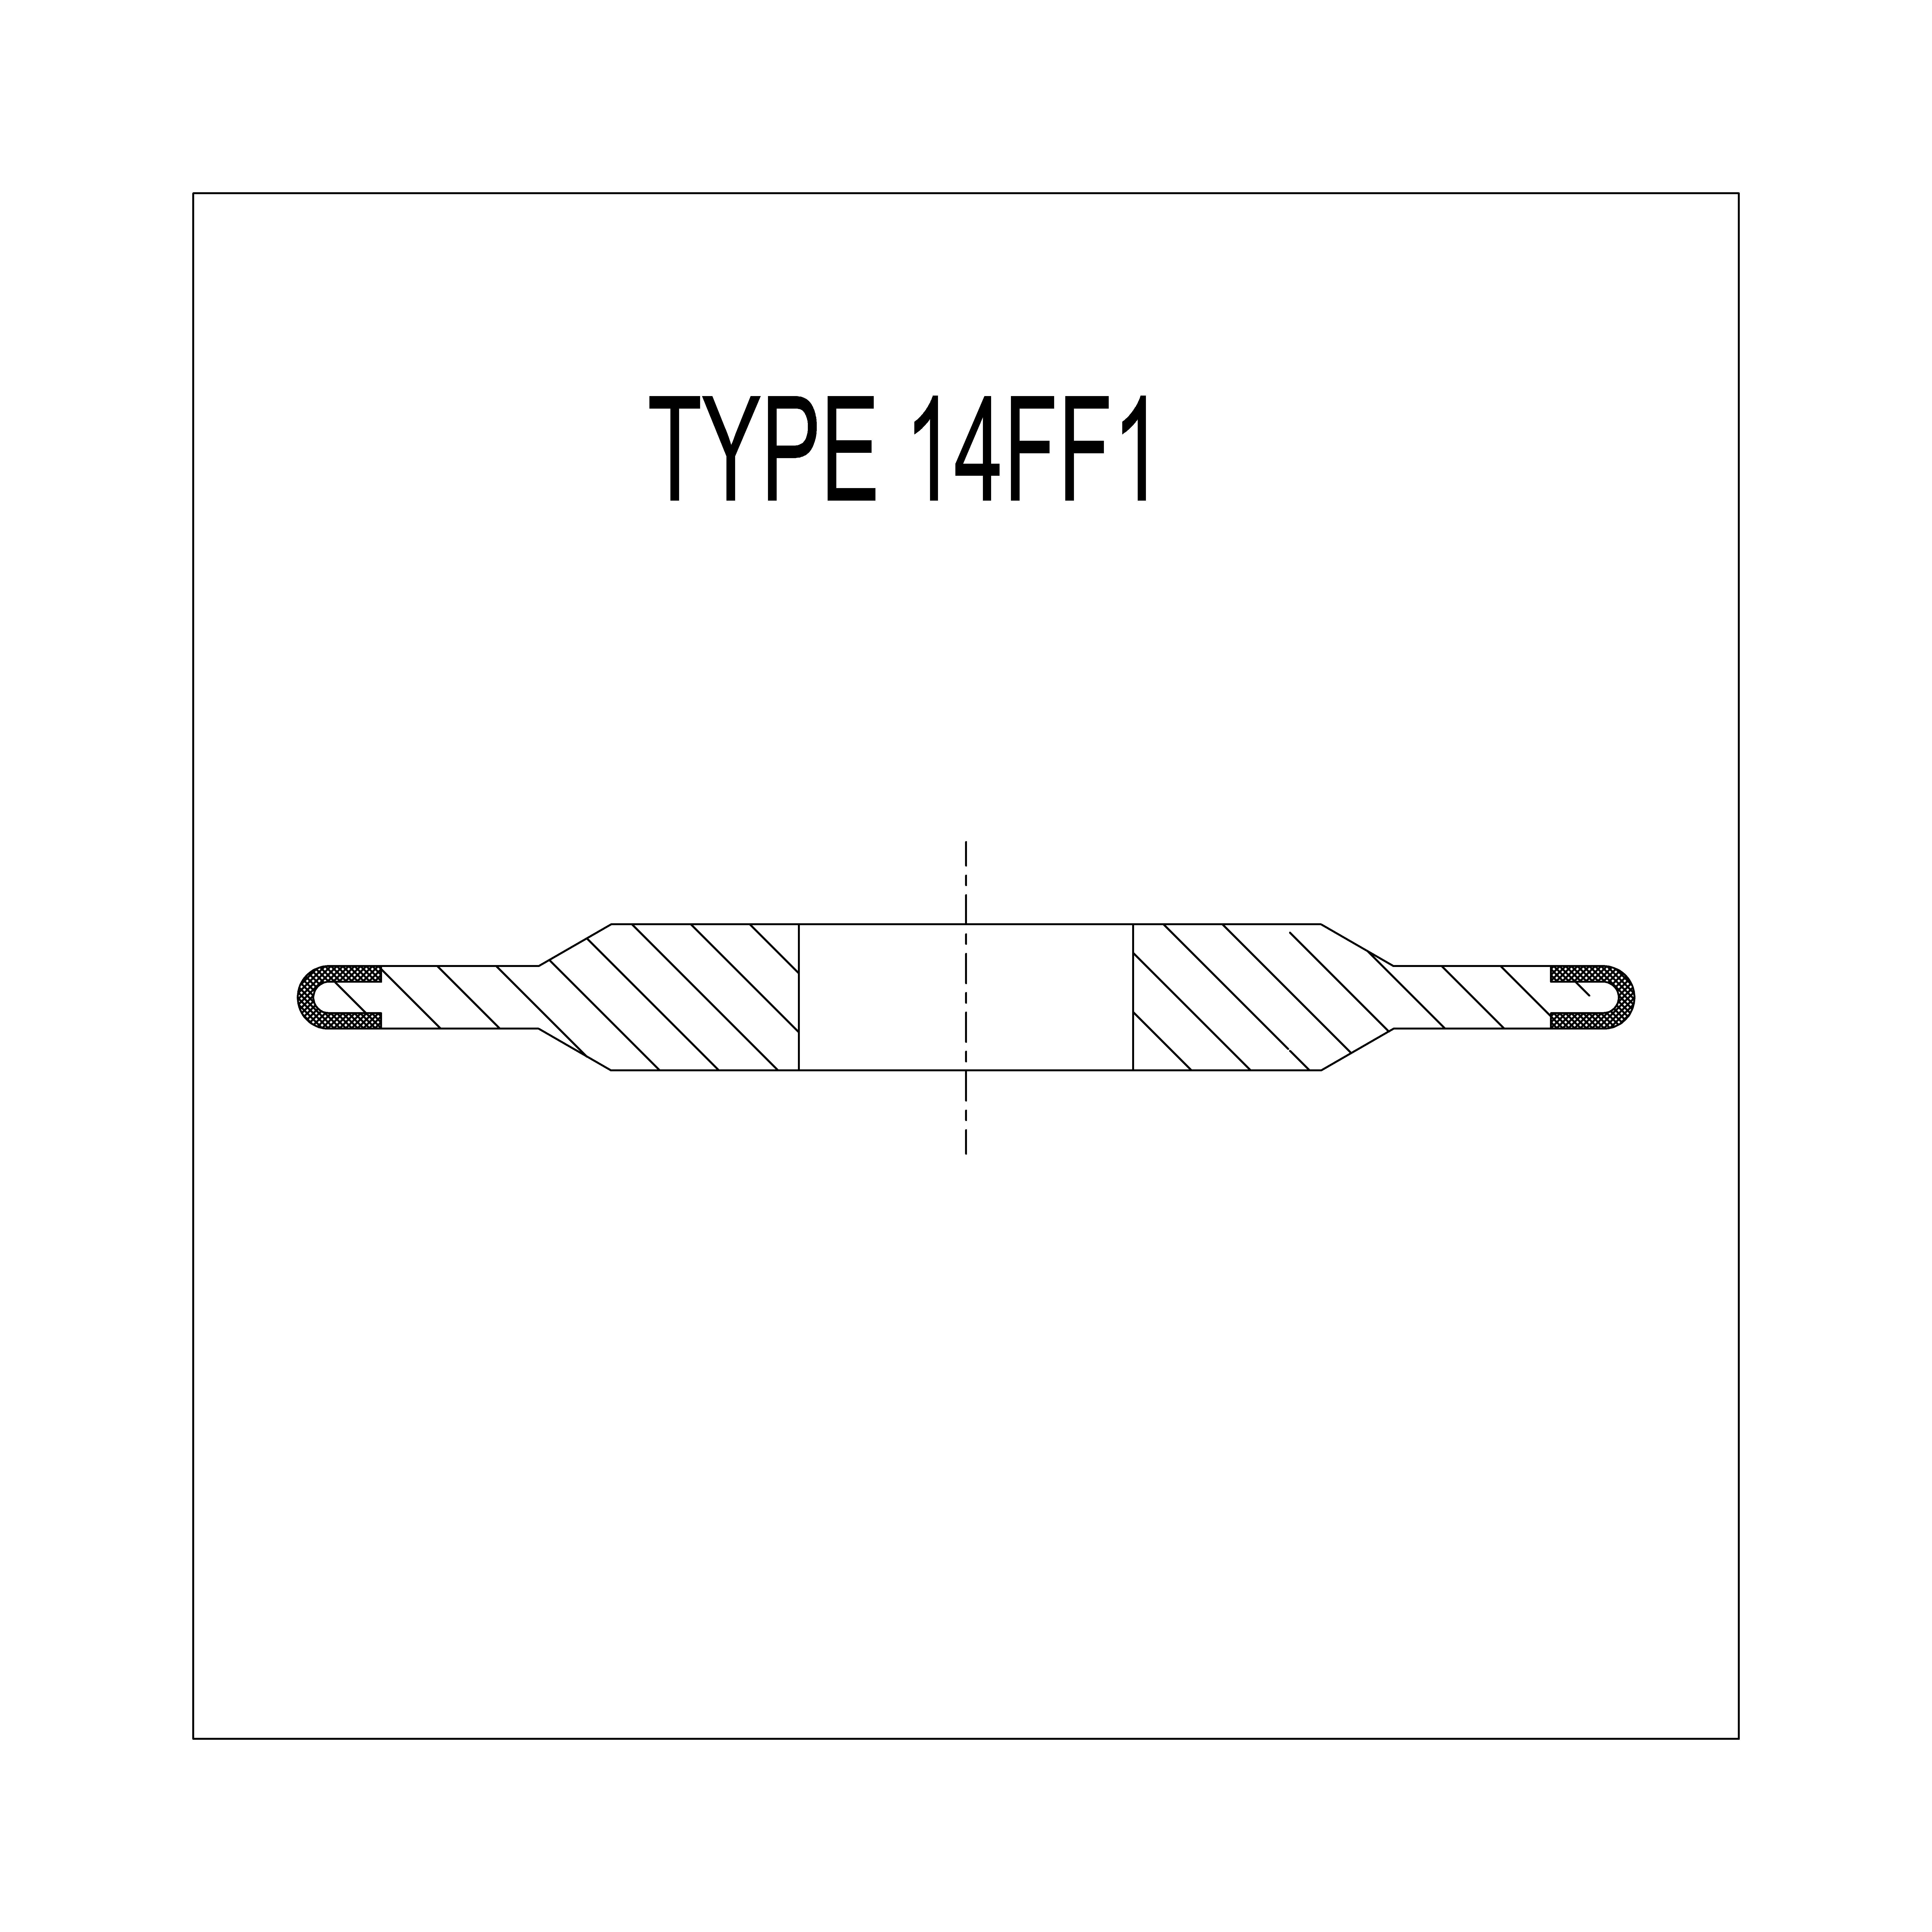 14FF1